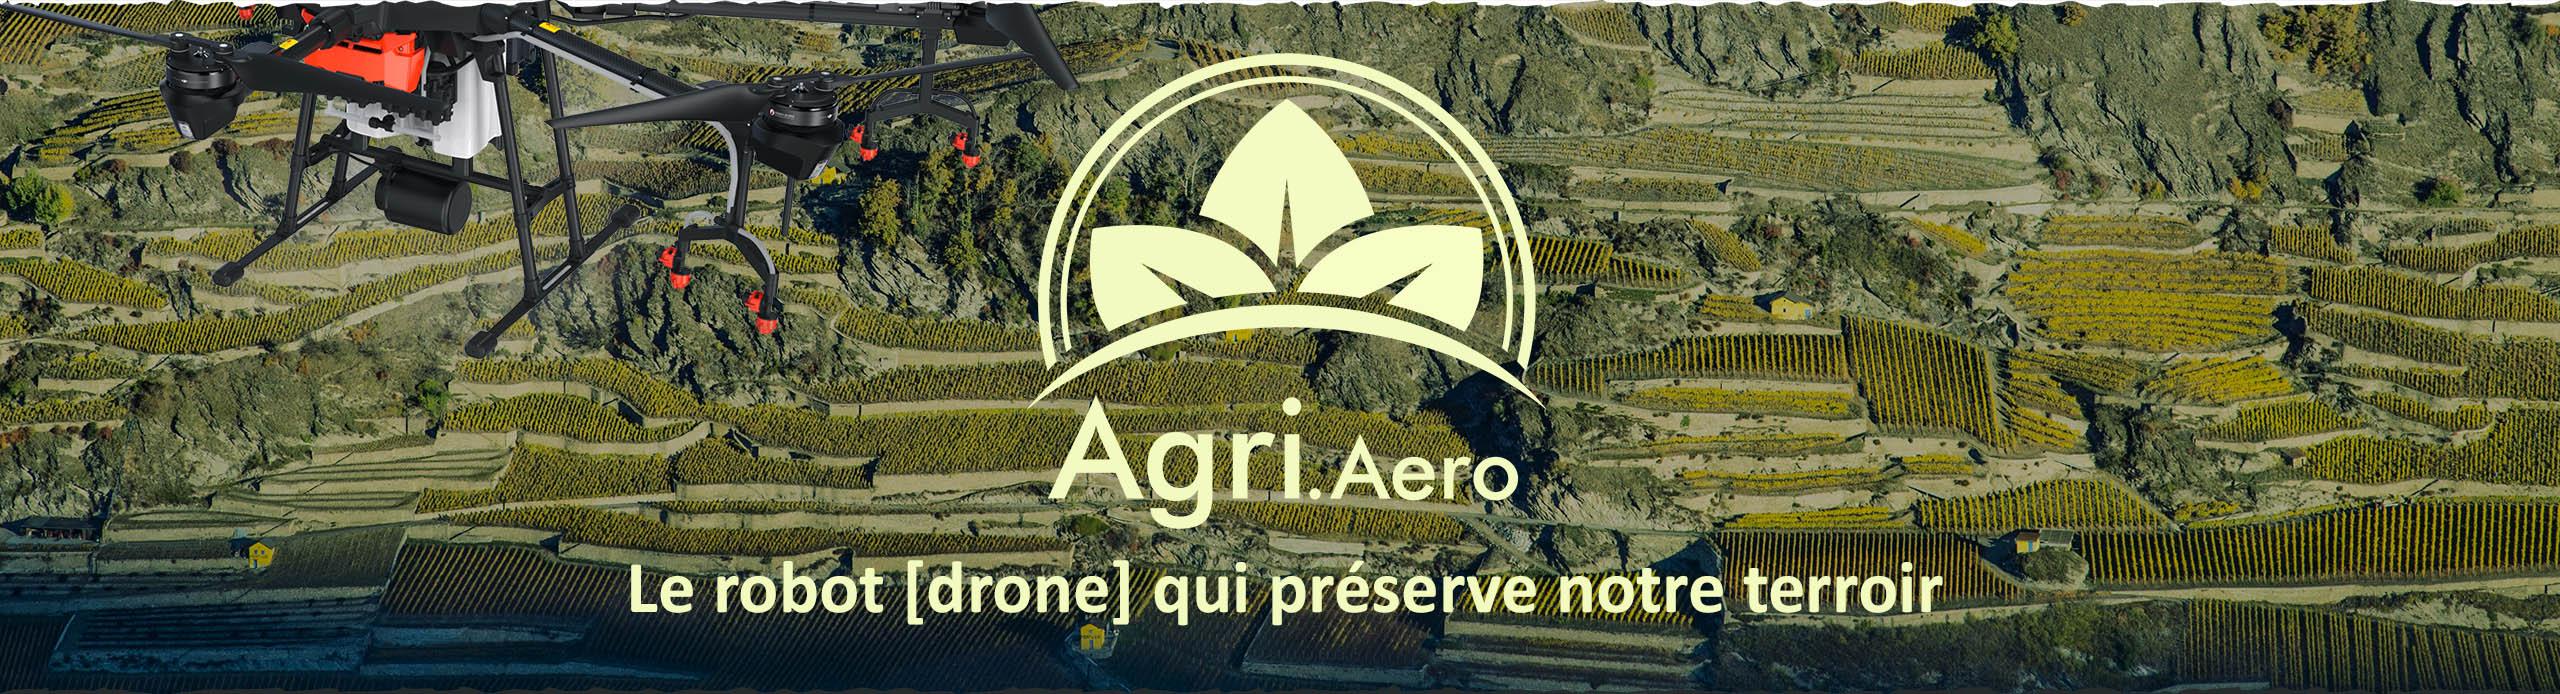 Bannière logo agri aero vignes sion valais drone